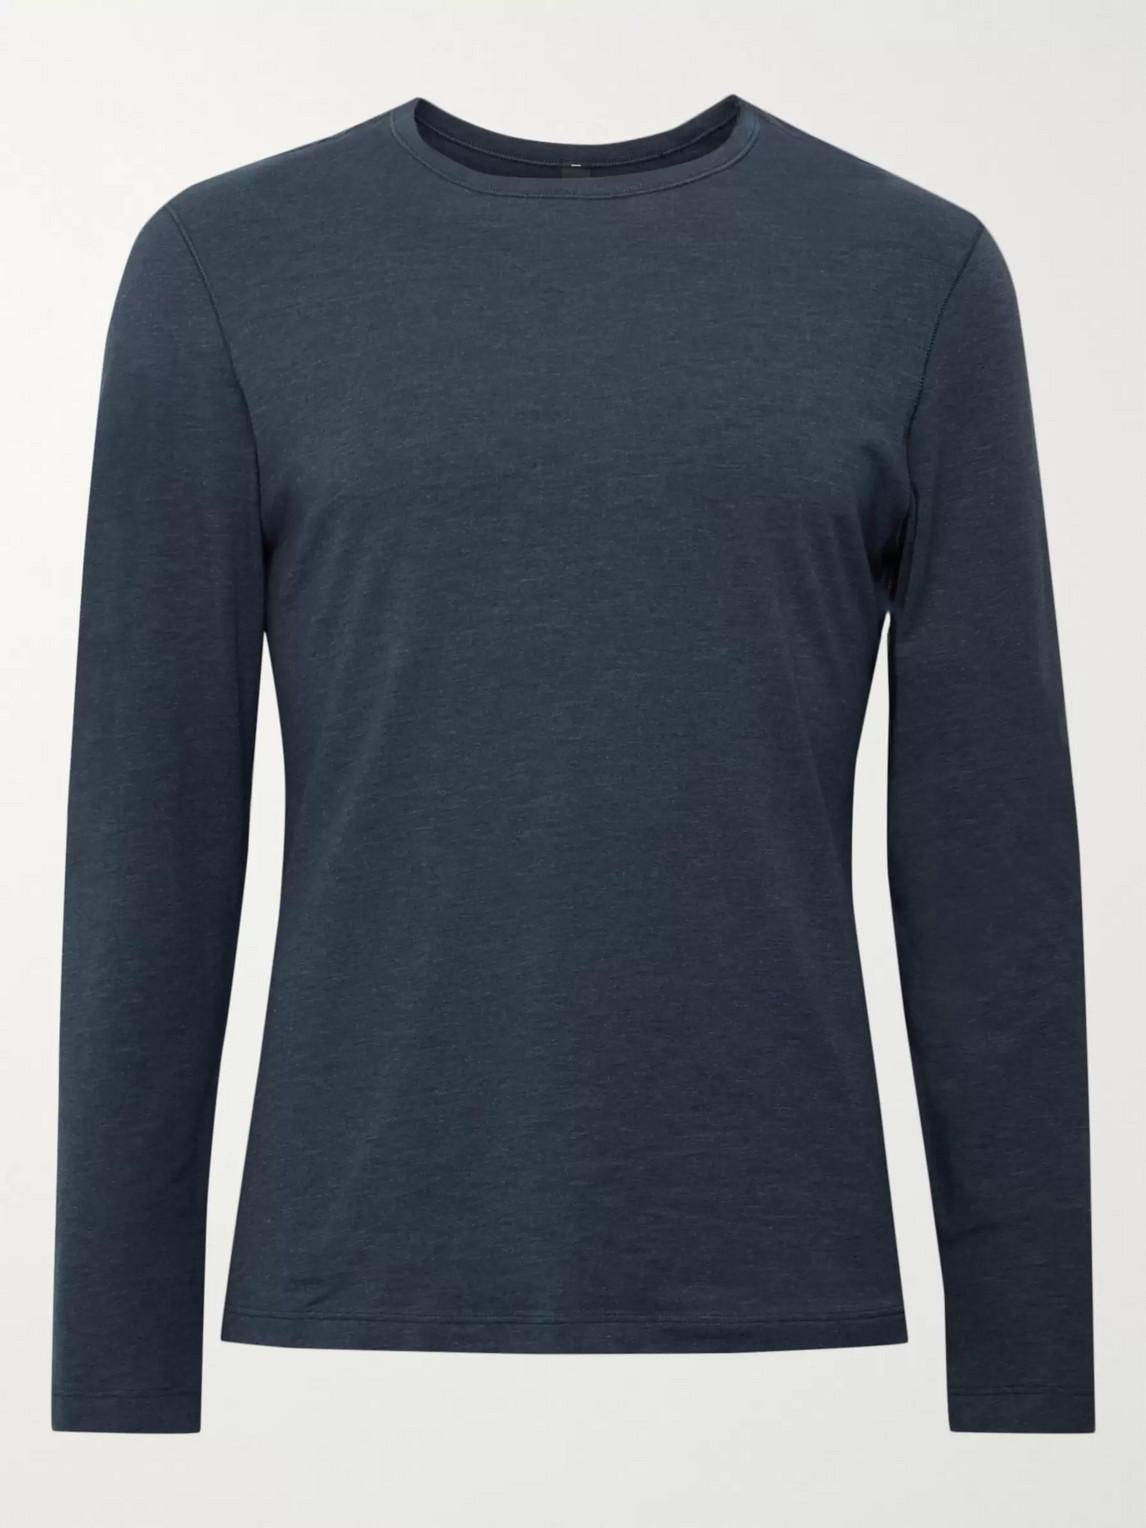 lululemon - 5 year basic mã©lange vitasea t-shirt - men - blue